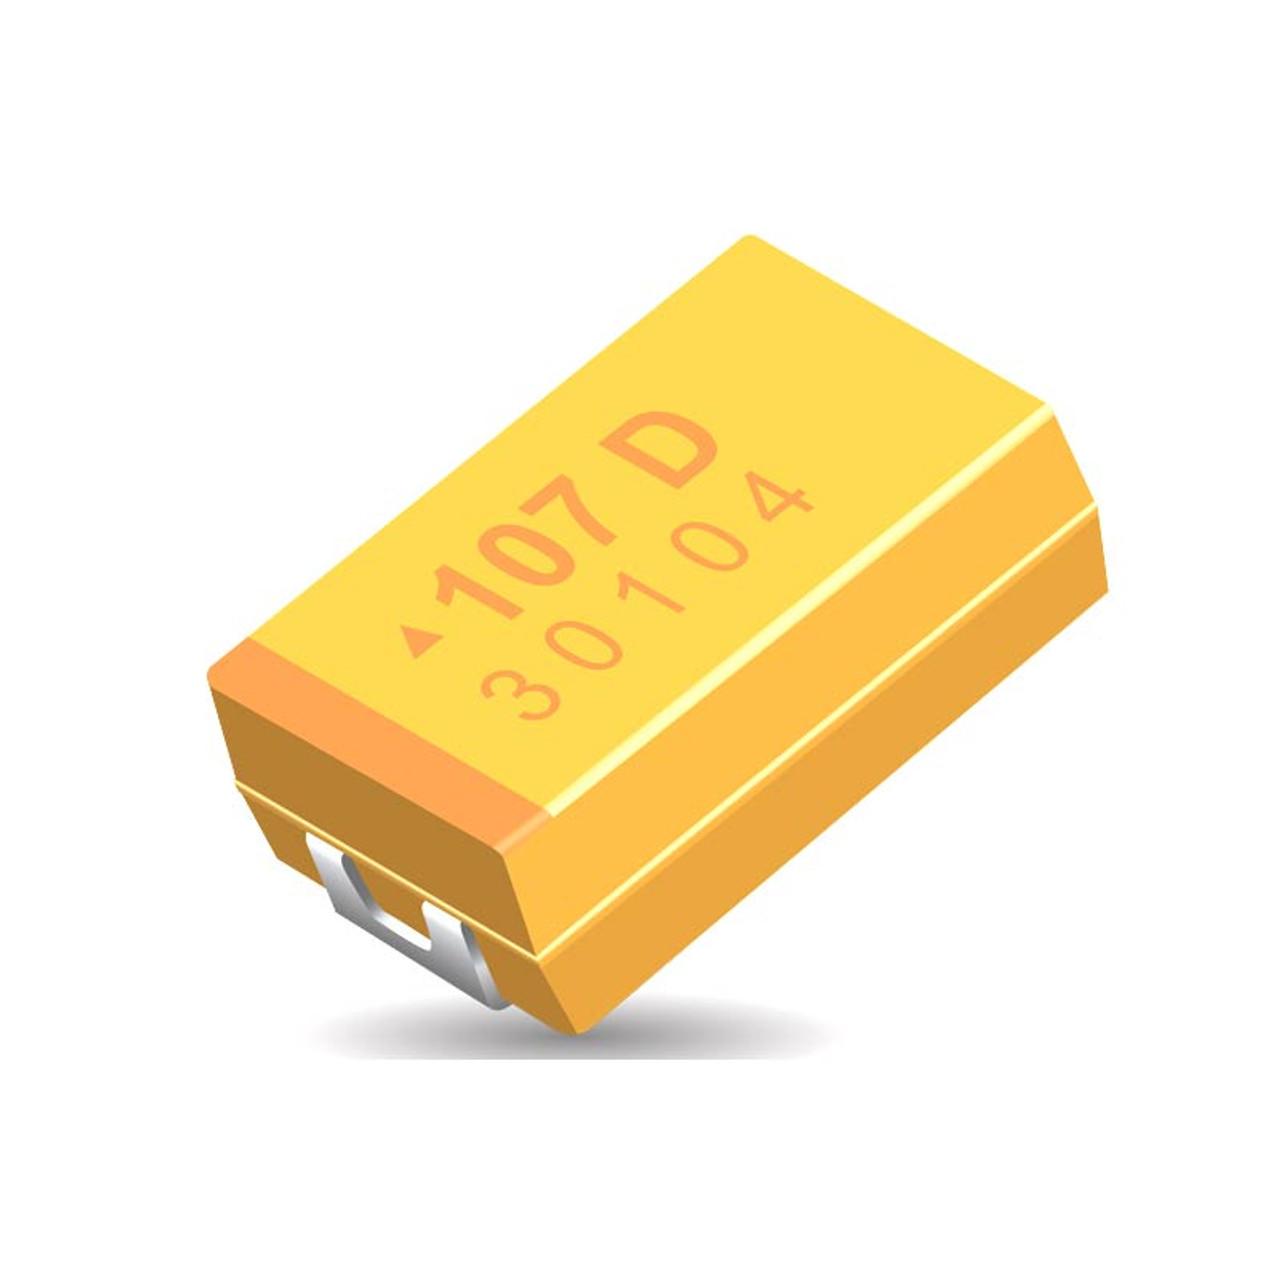 6.3 V 100uF TAJC 107K006RNJ AVX tantalio condensadores C-SMD Talla 2312 6032-28 5 un